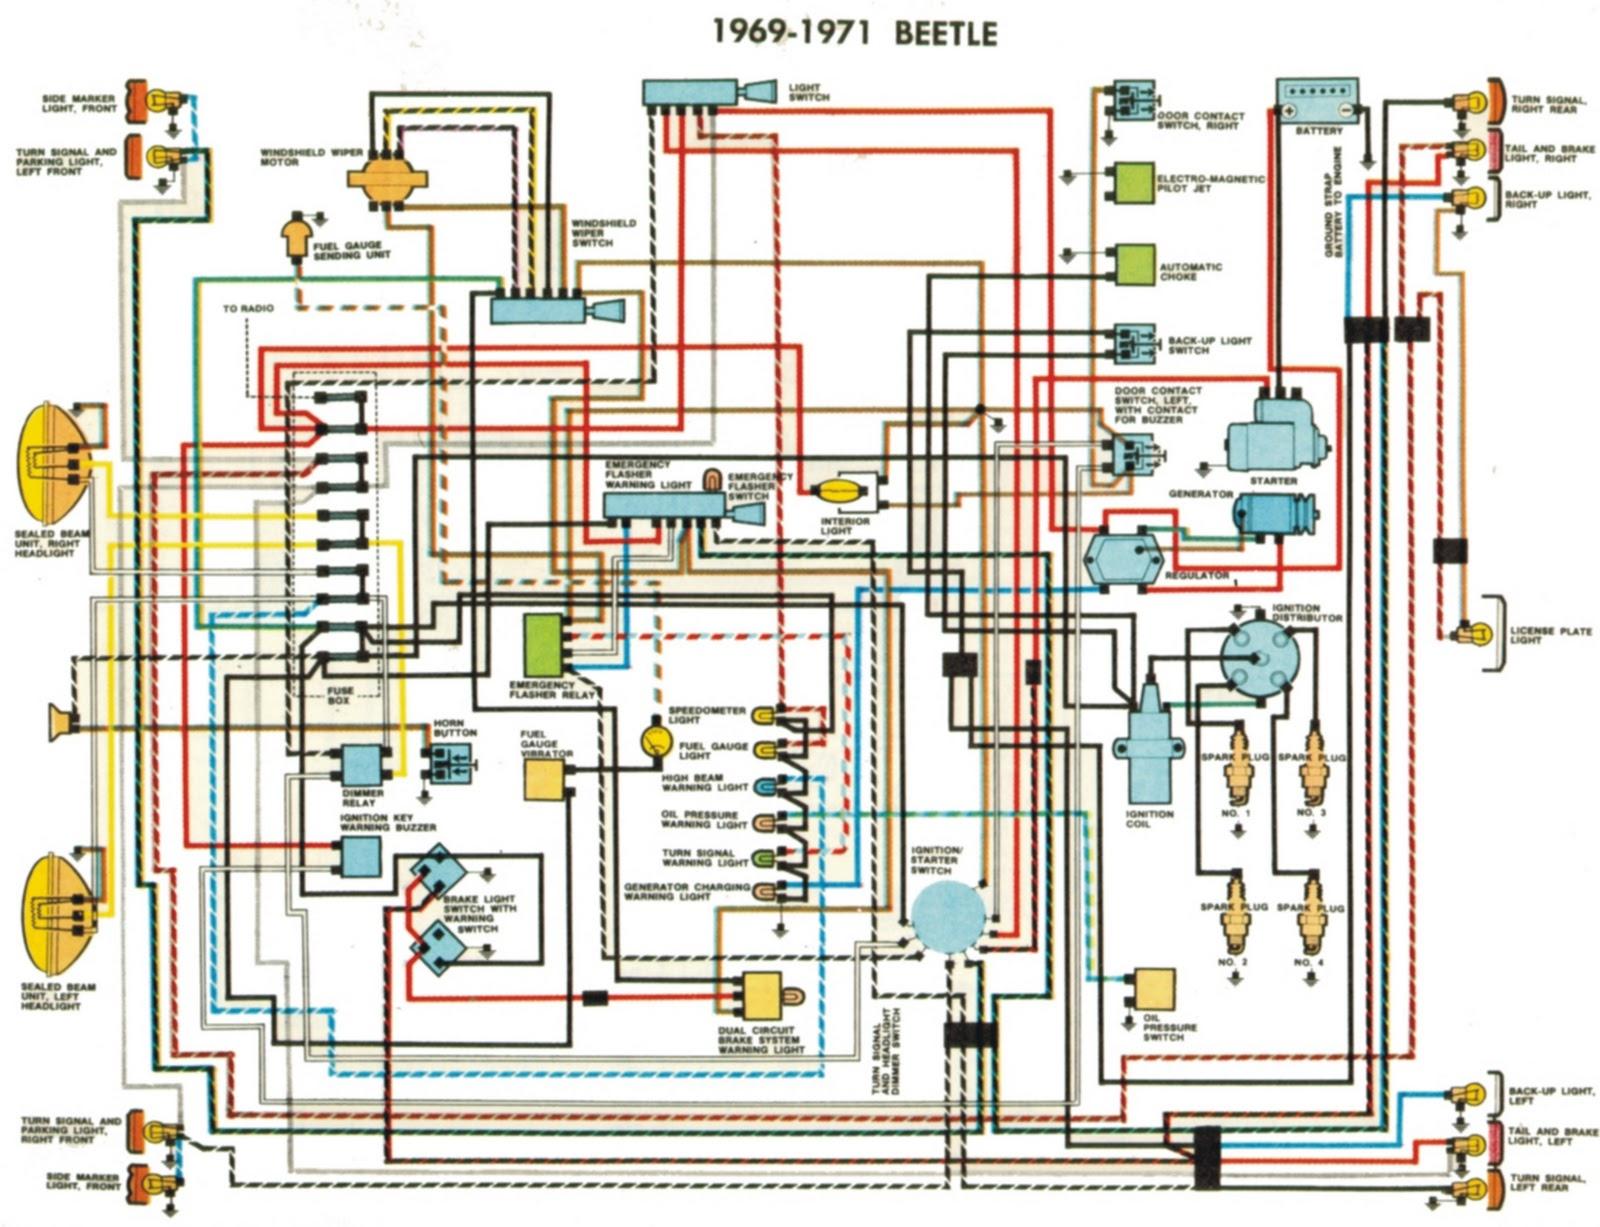 hight resolution of 2001 vw beetle wiring diagram 2001 vw beetle fuse diagram beautiful diagram 2001 vw beetle